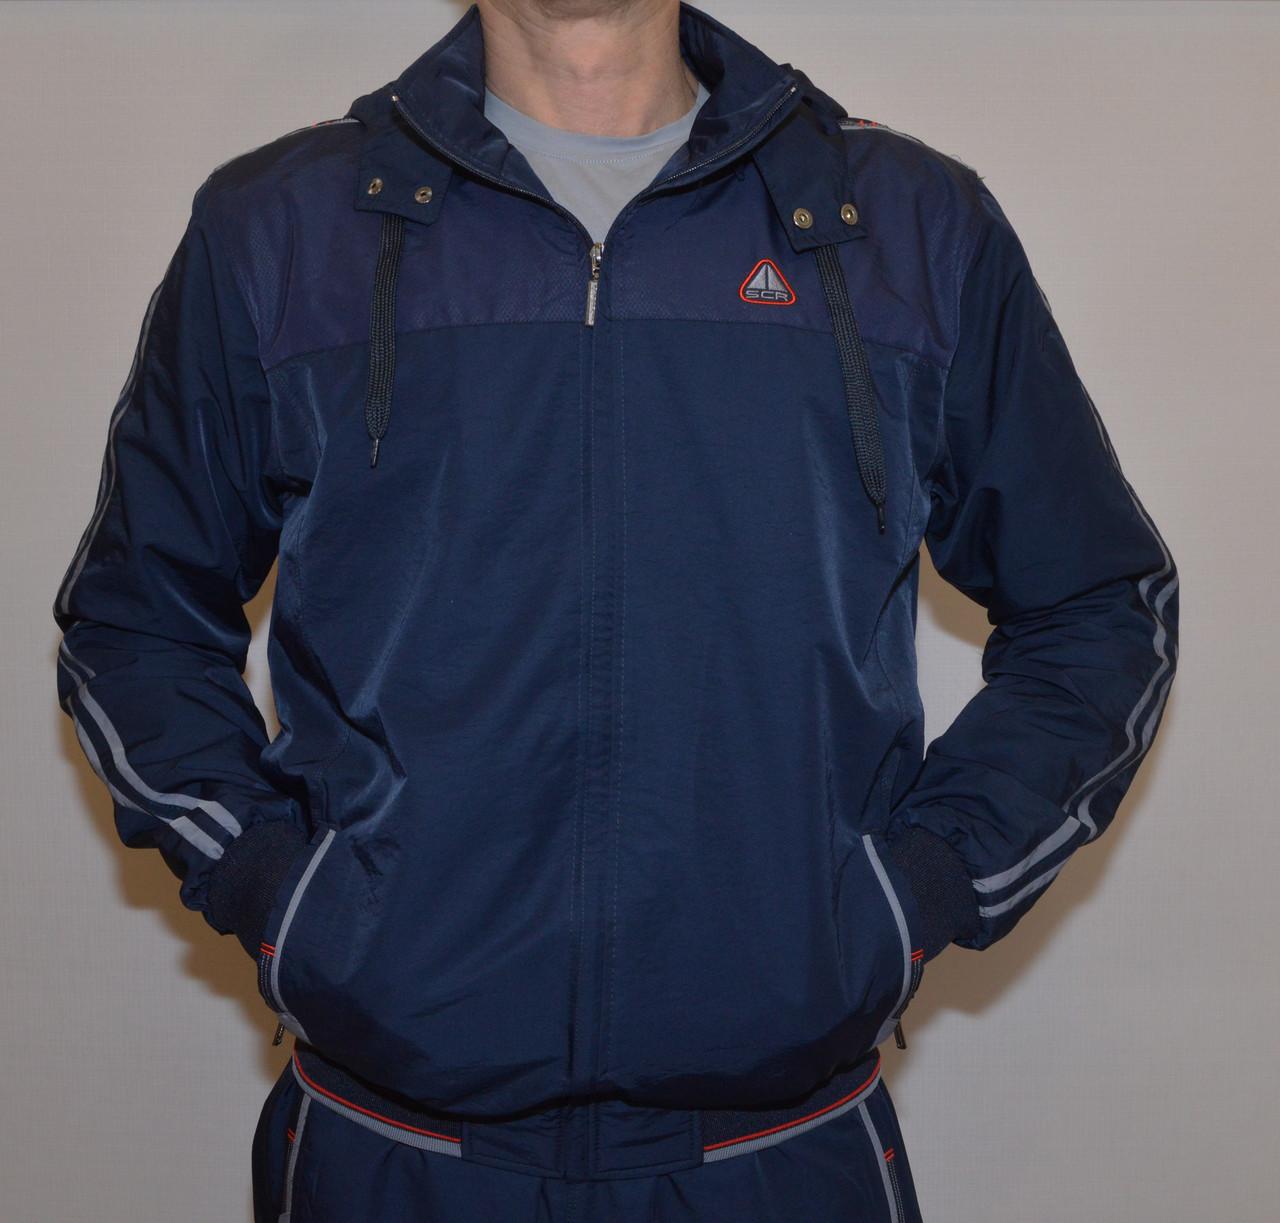 46070e7c Мужской спортивный костюм плащевка SOCCER 2852 - Casual Wear Shop в Умани